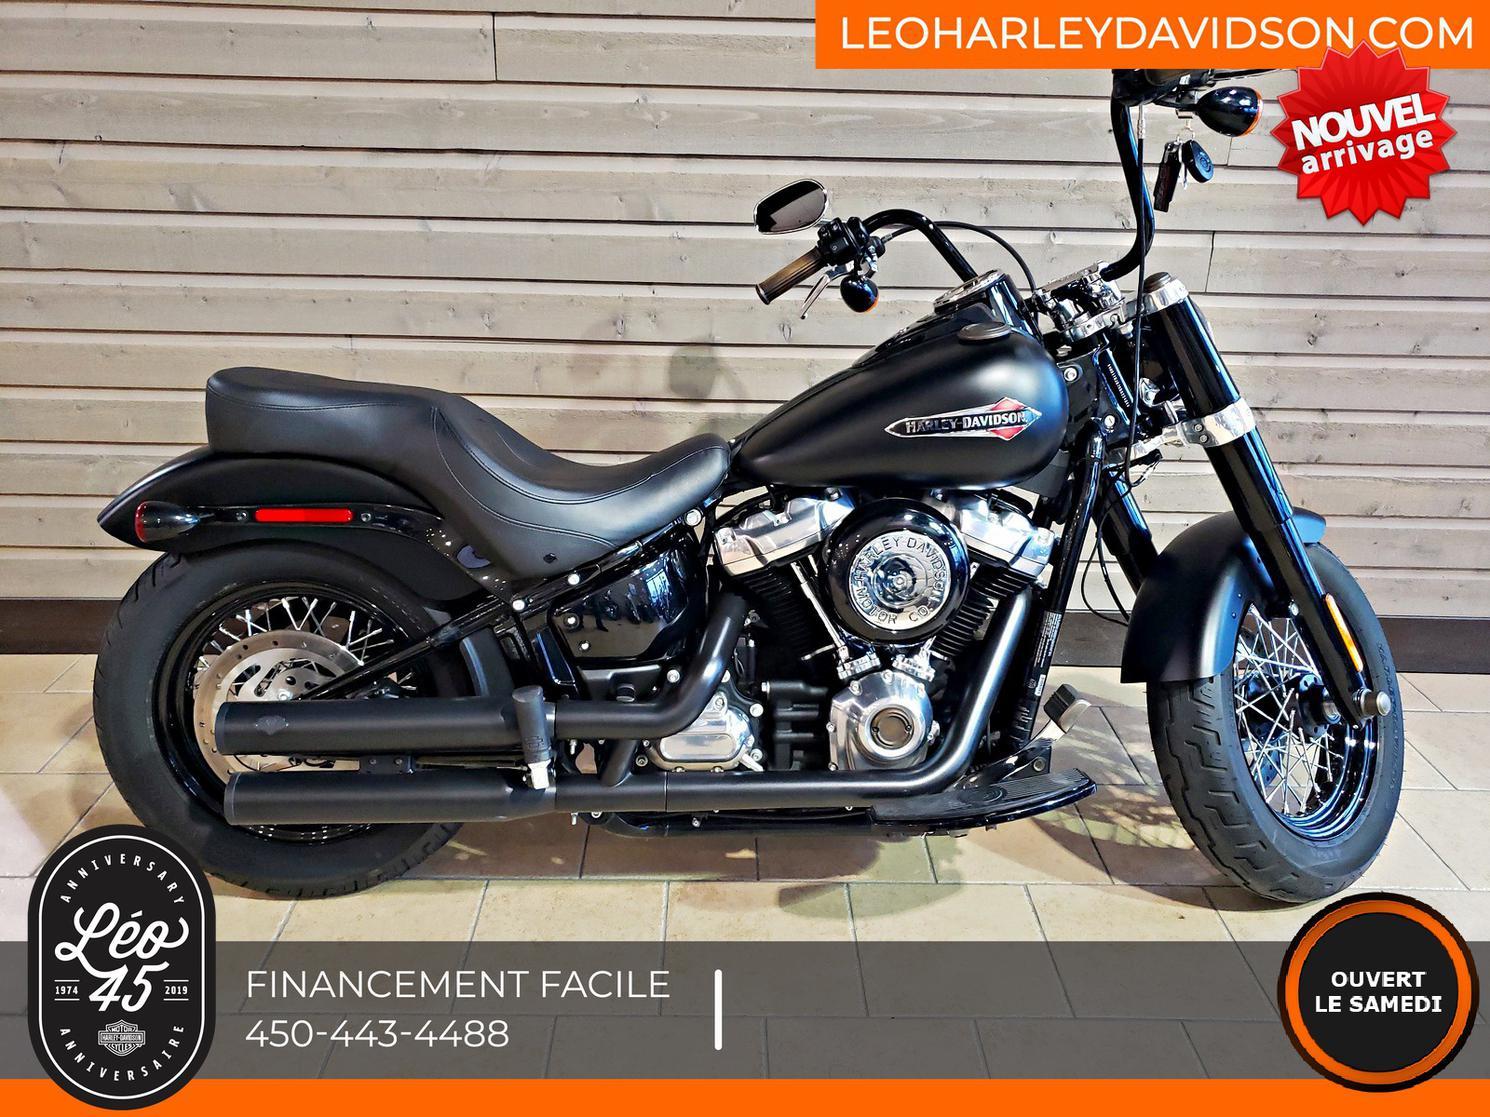 2019 Harley-Davidson ST-Softail Slim - FLSL